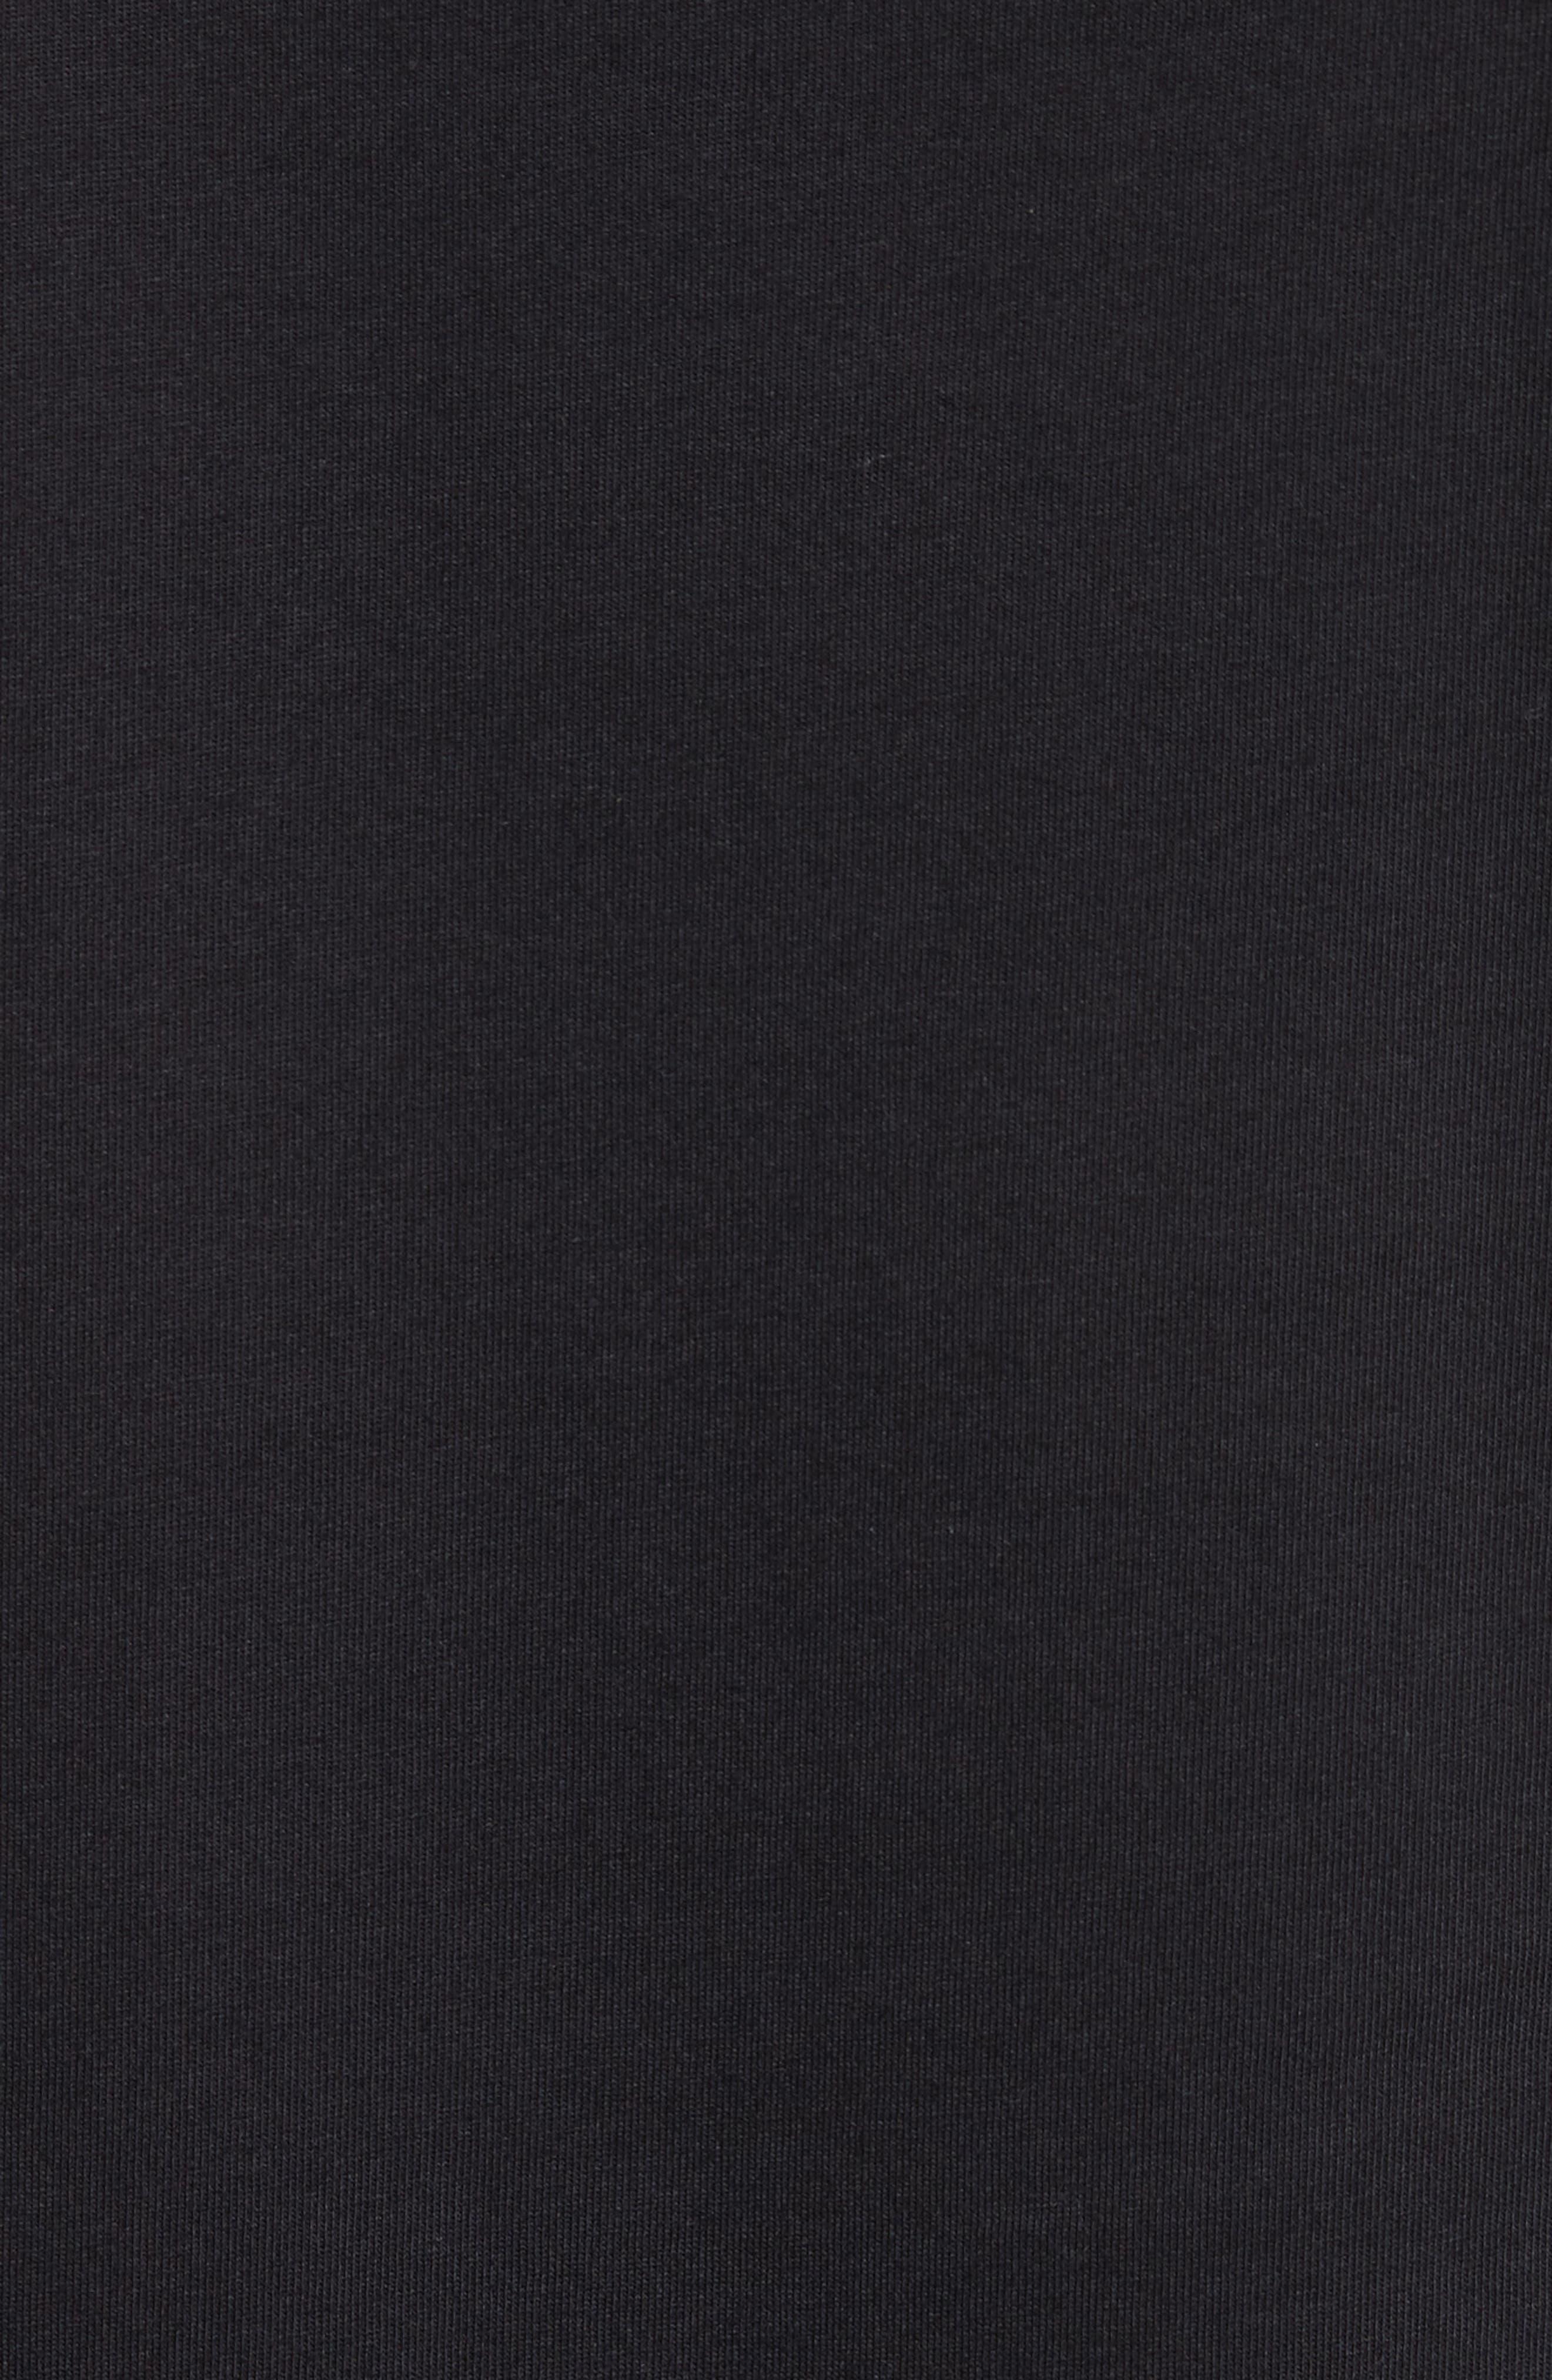 Embroidered Zebra T-Shirt,                             Alternate thumbnail 5, color,                             Black